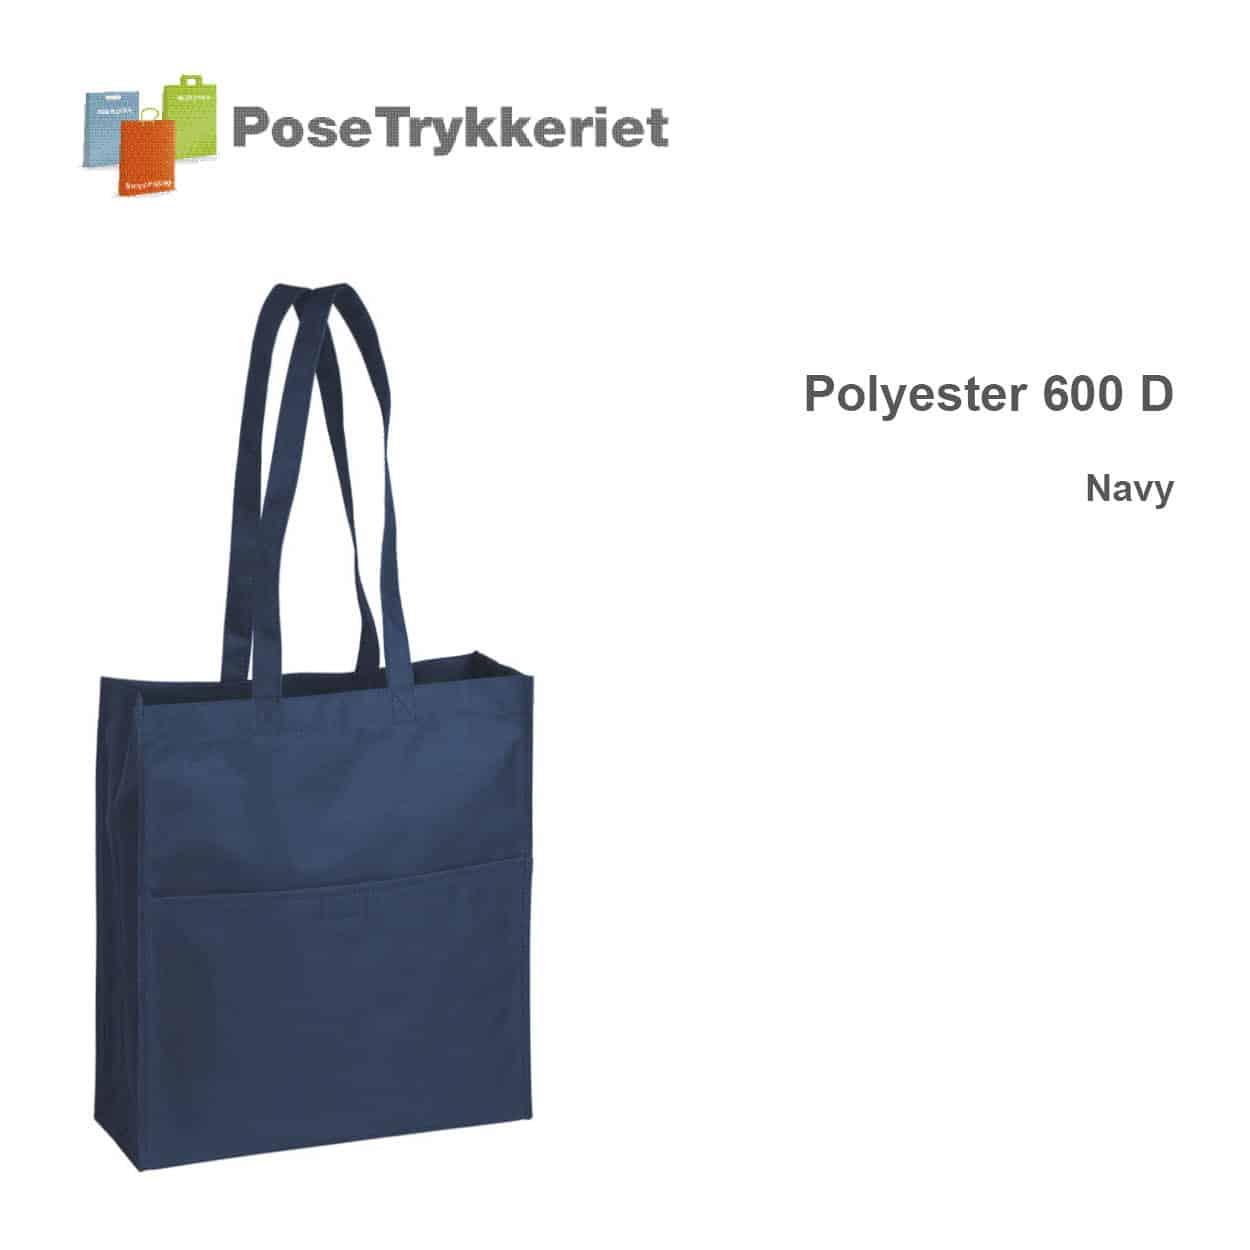 Revisorpose med lange hanke. 600 D NAVY. PoseTrykkeriet.dk